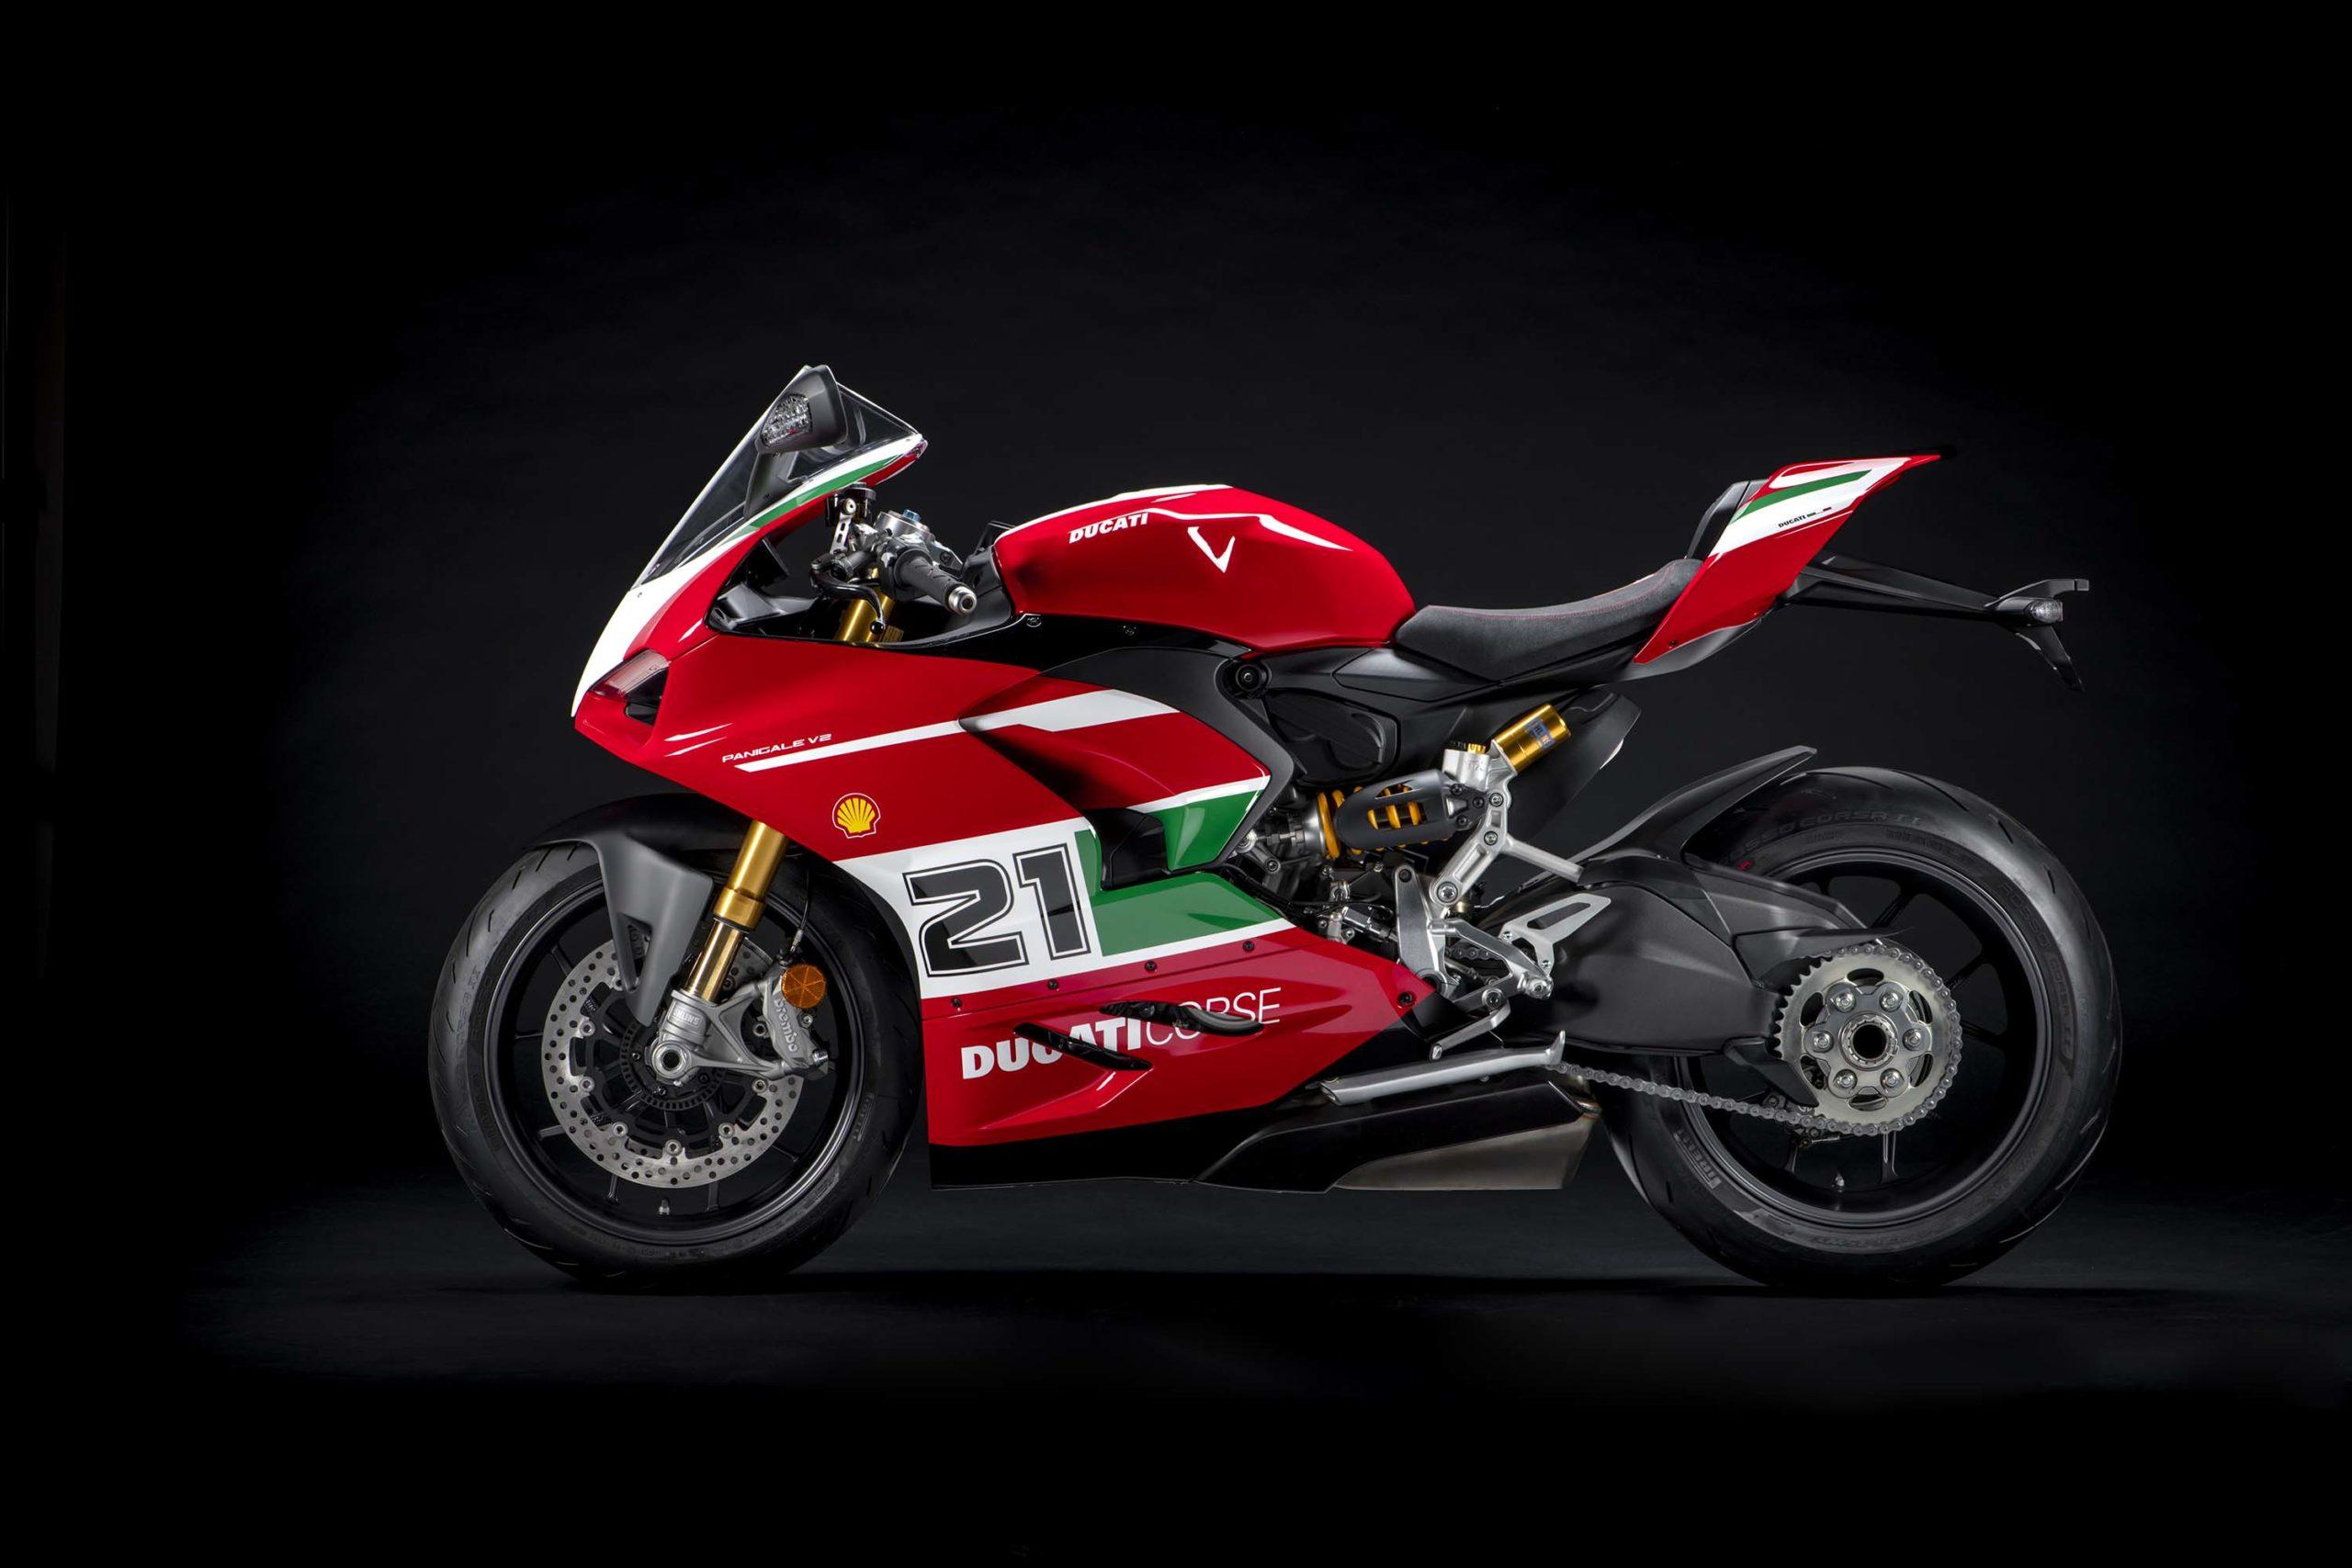 Ducati-Panigale-V4-Troy-Bayliss-52-scale